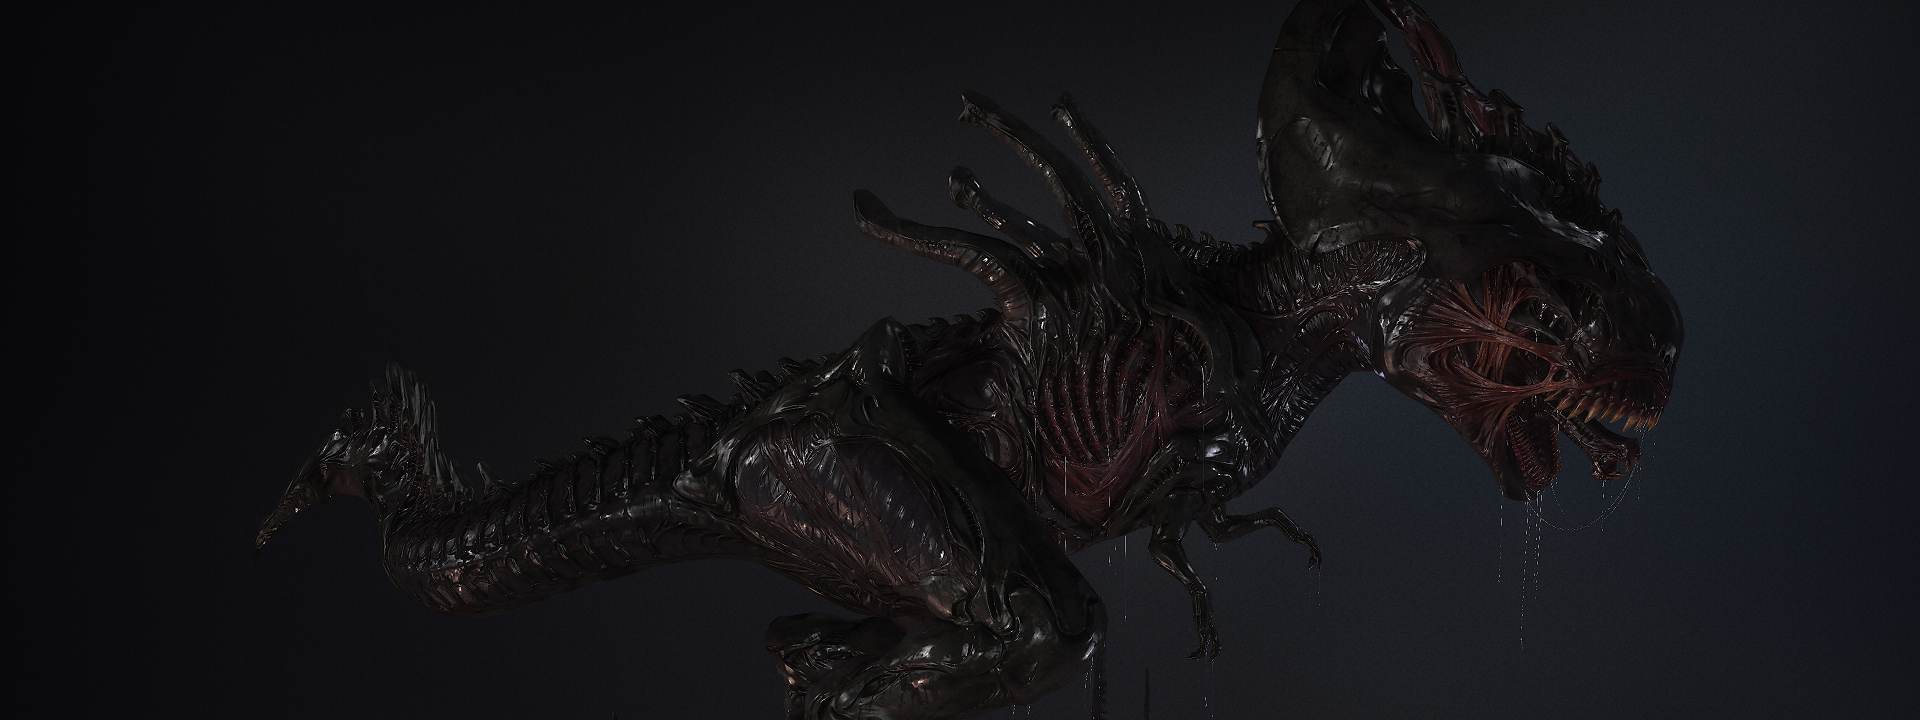 Xenomorph Alien Rex фильм и игра Art